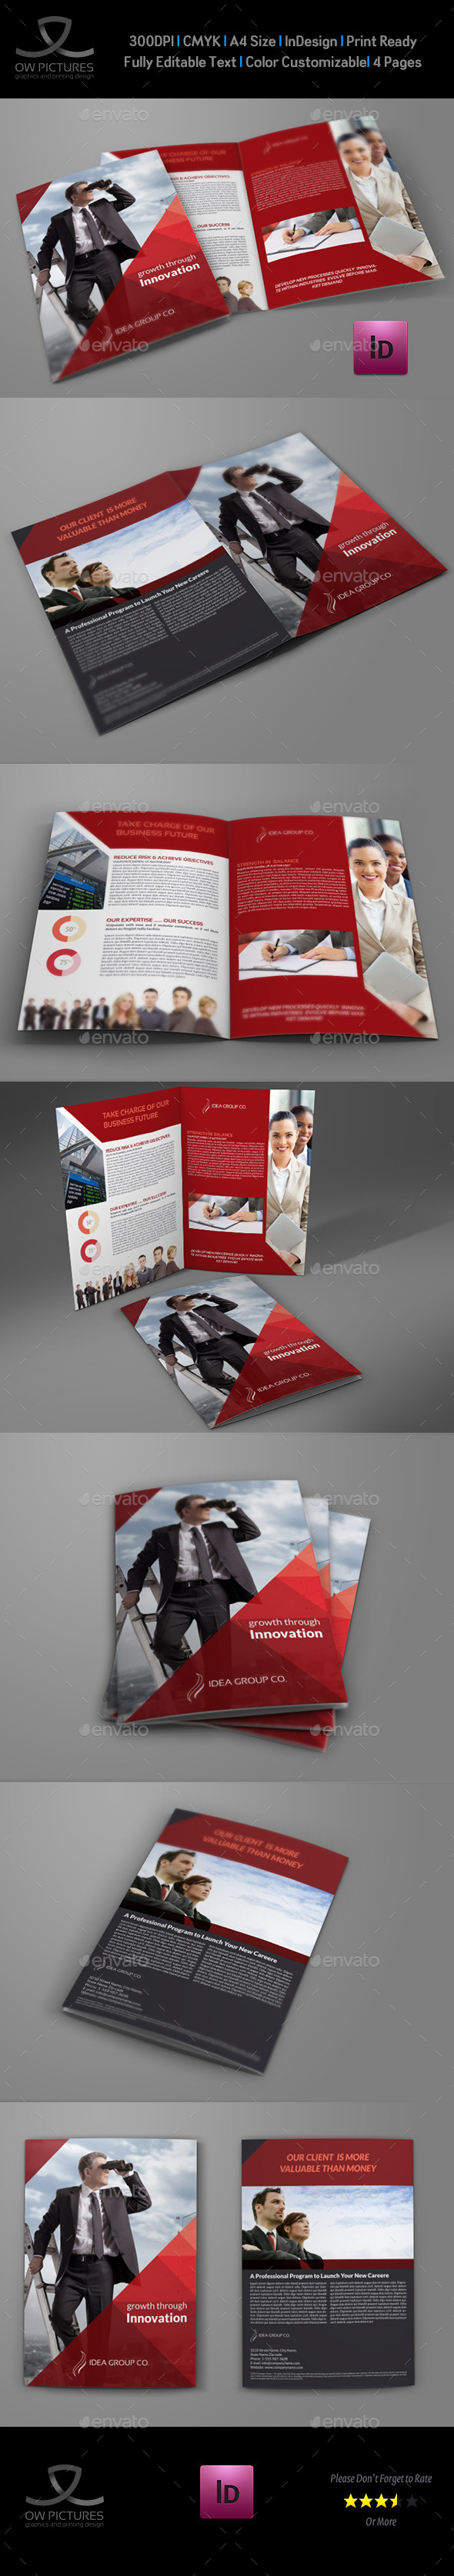 Company Brochure Bi-Fold Template Vol.37 - Corporate Brochures